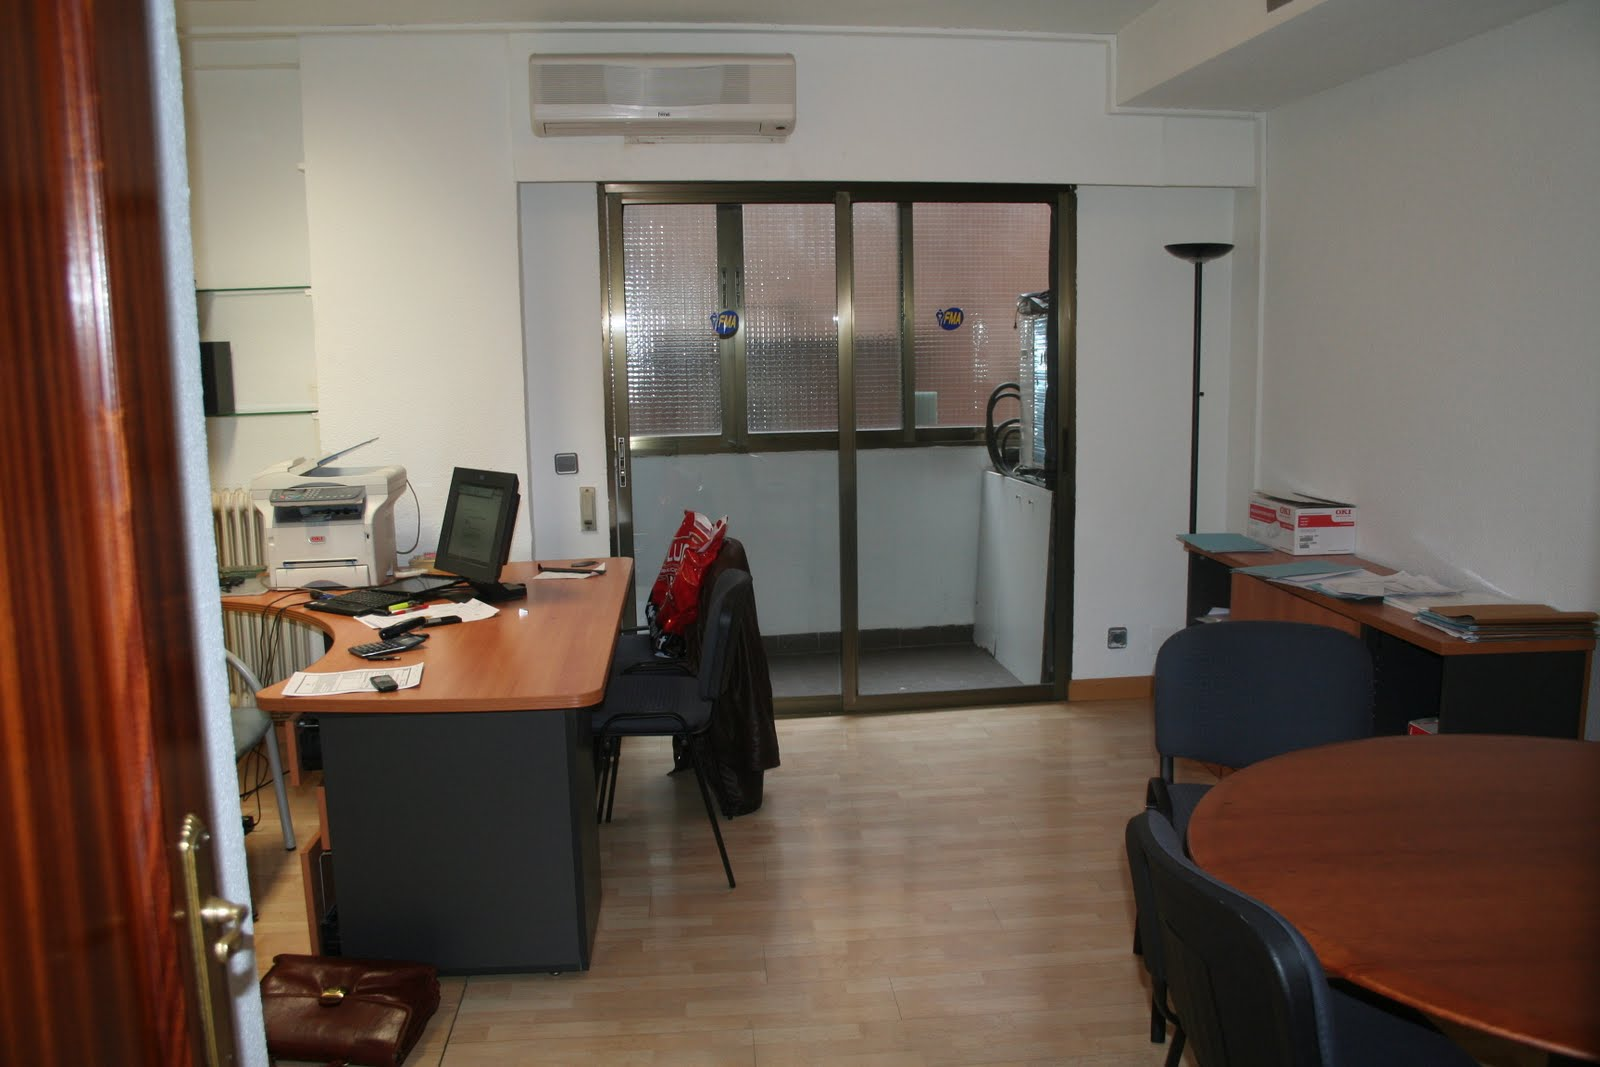 Oficinas madrid oficina reformada en alquiler en for Alquiler muebles madrid